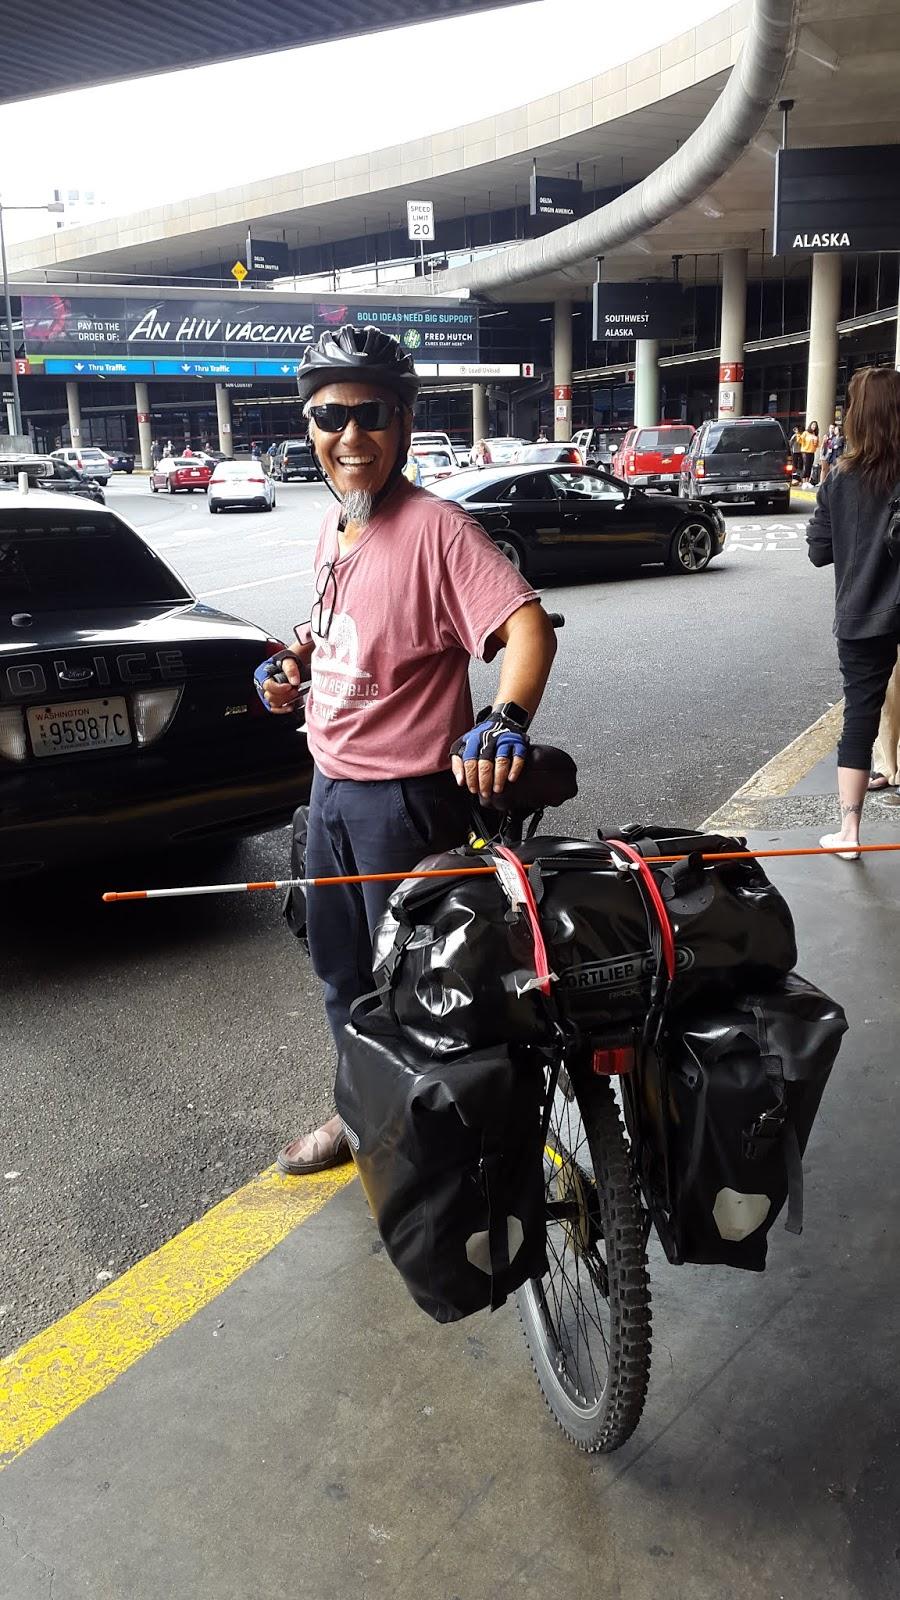 Tasman Jen dengan sepedanya di Airport Sea Tac (Seattle–Tacoma International Airport).